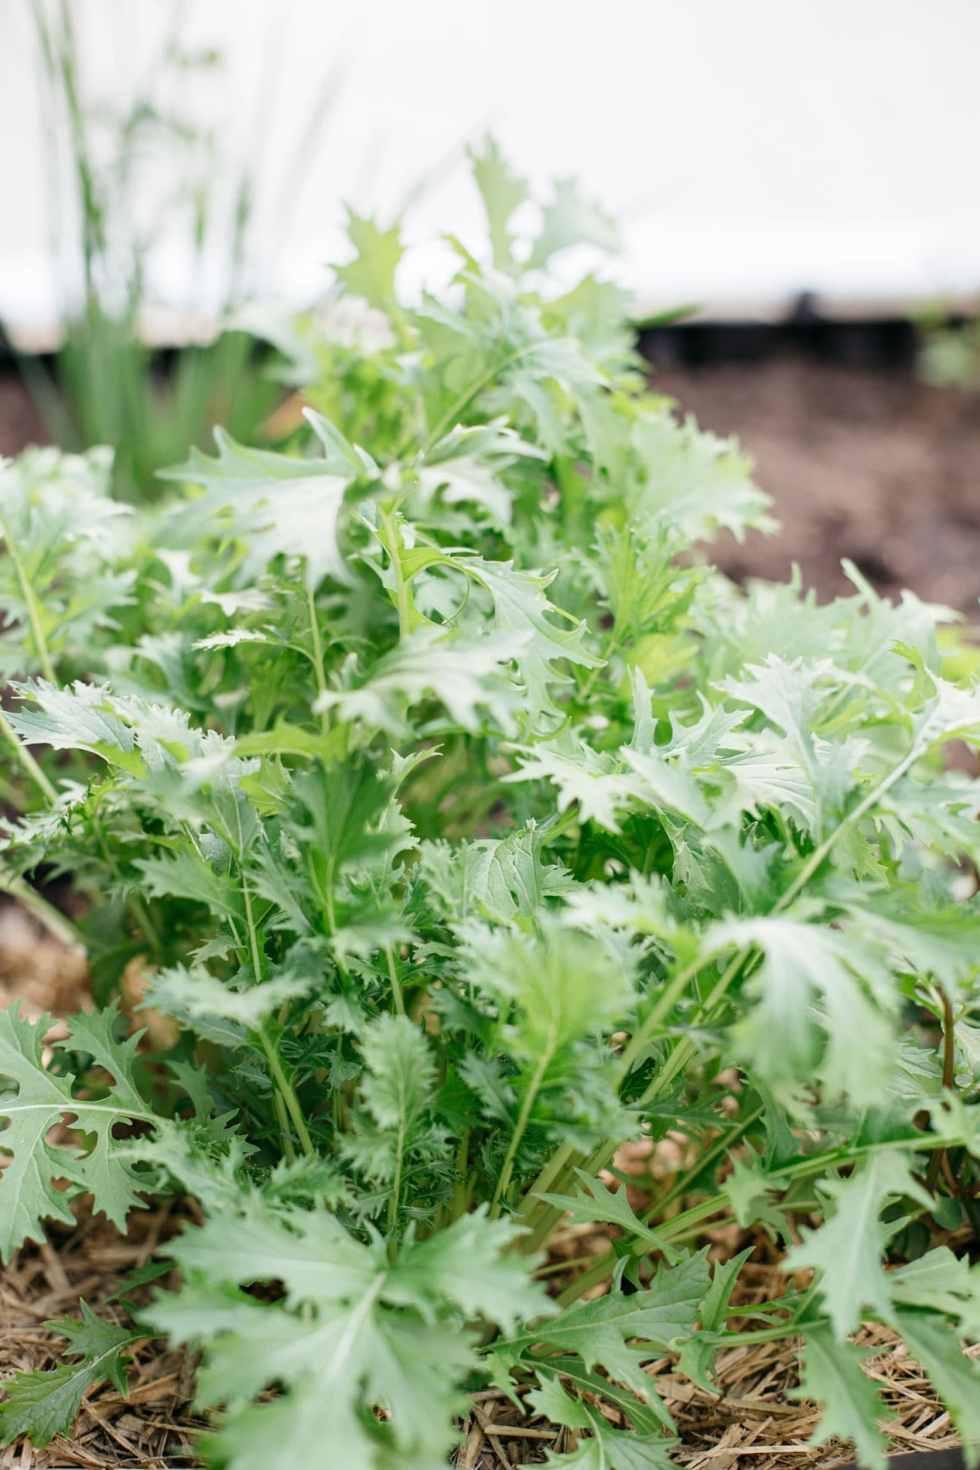 Mizuna(brassica) growing in my back yard